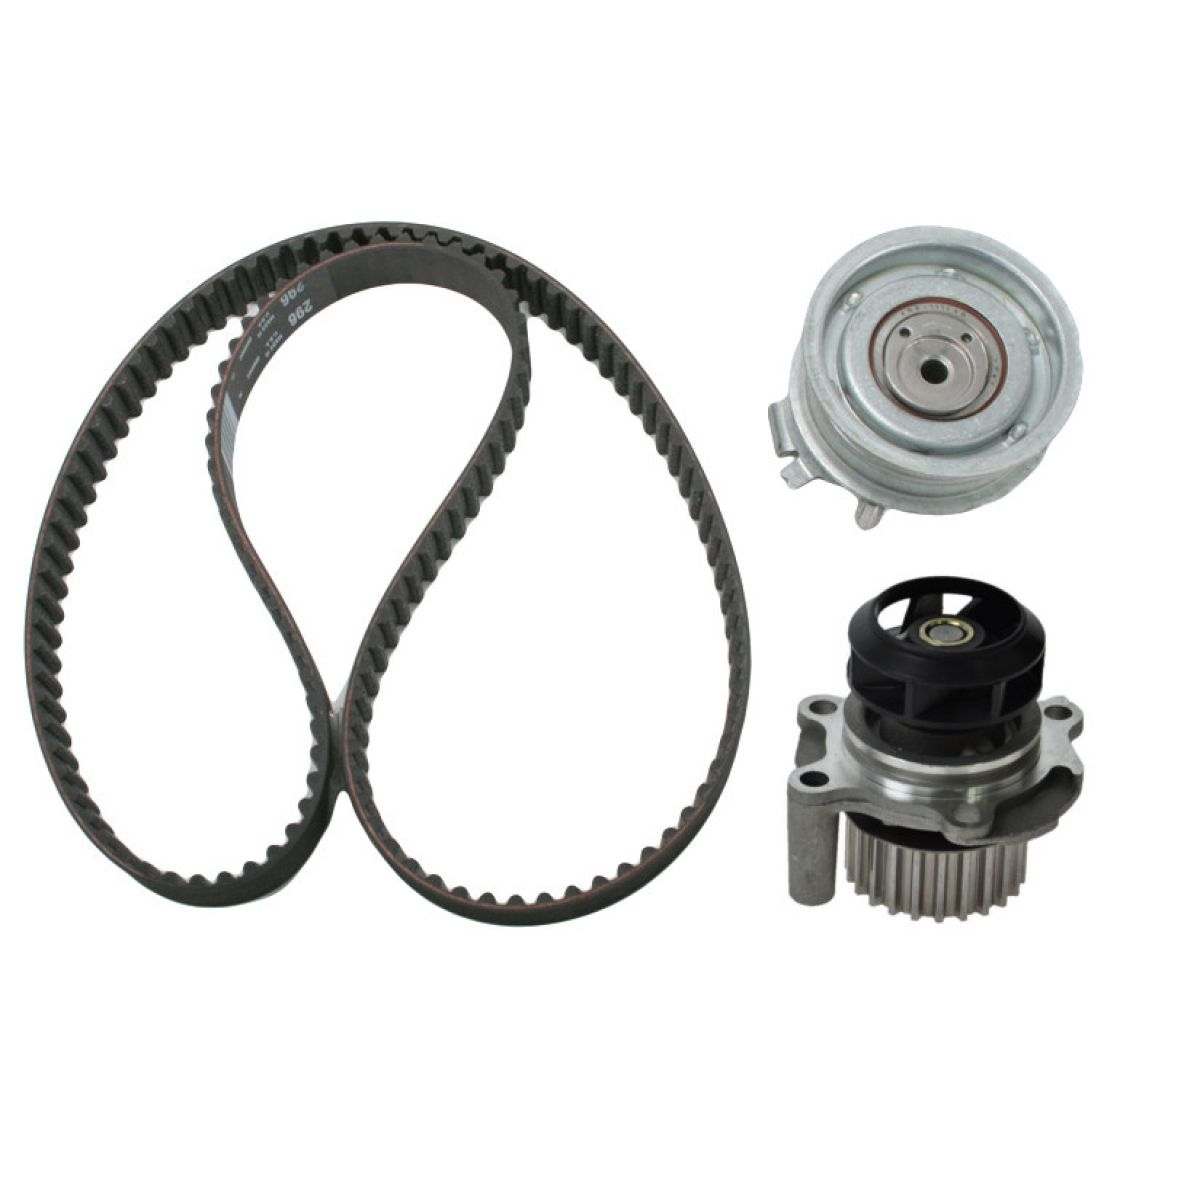 Timing Belt Set Kit W Water Pump For Volkswagen Vw Golf Jetta Beetle 20l